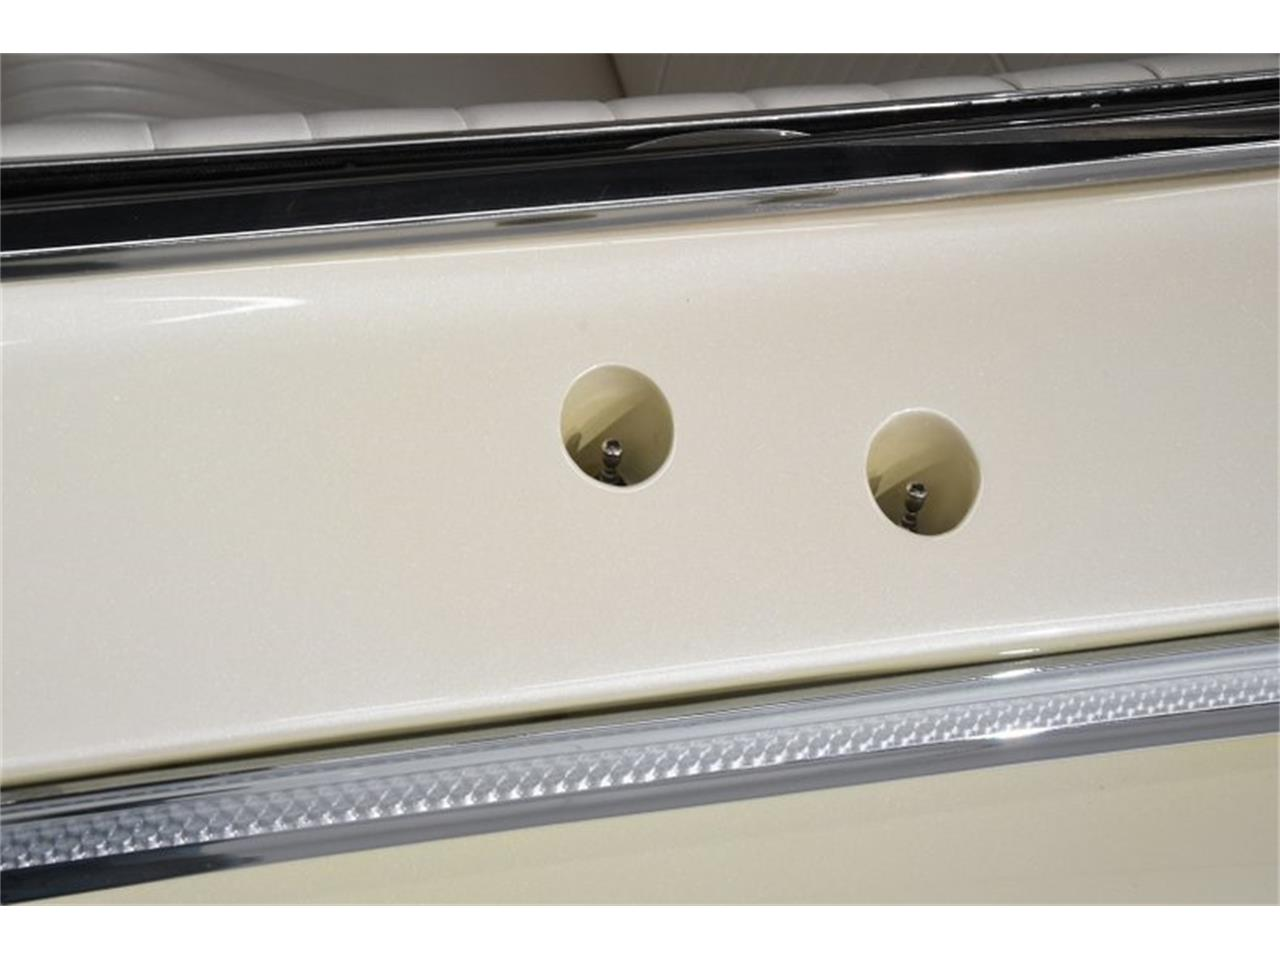 Large Picture of Classic 1962 Impala located in Illinois - $51,998.00 - QIVA